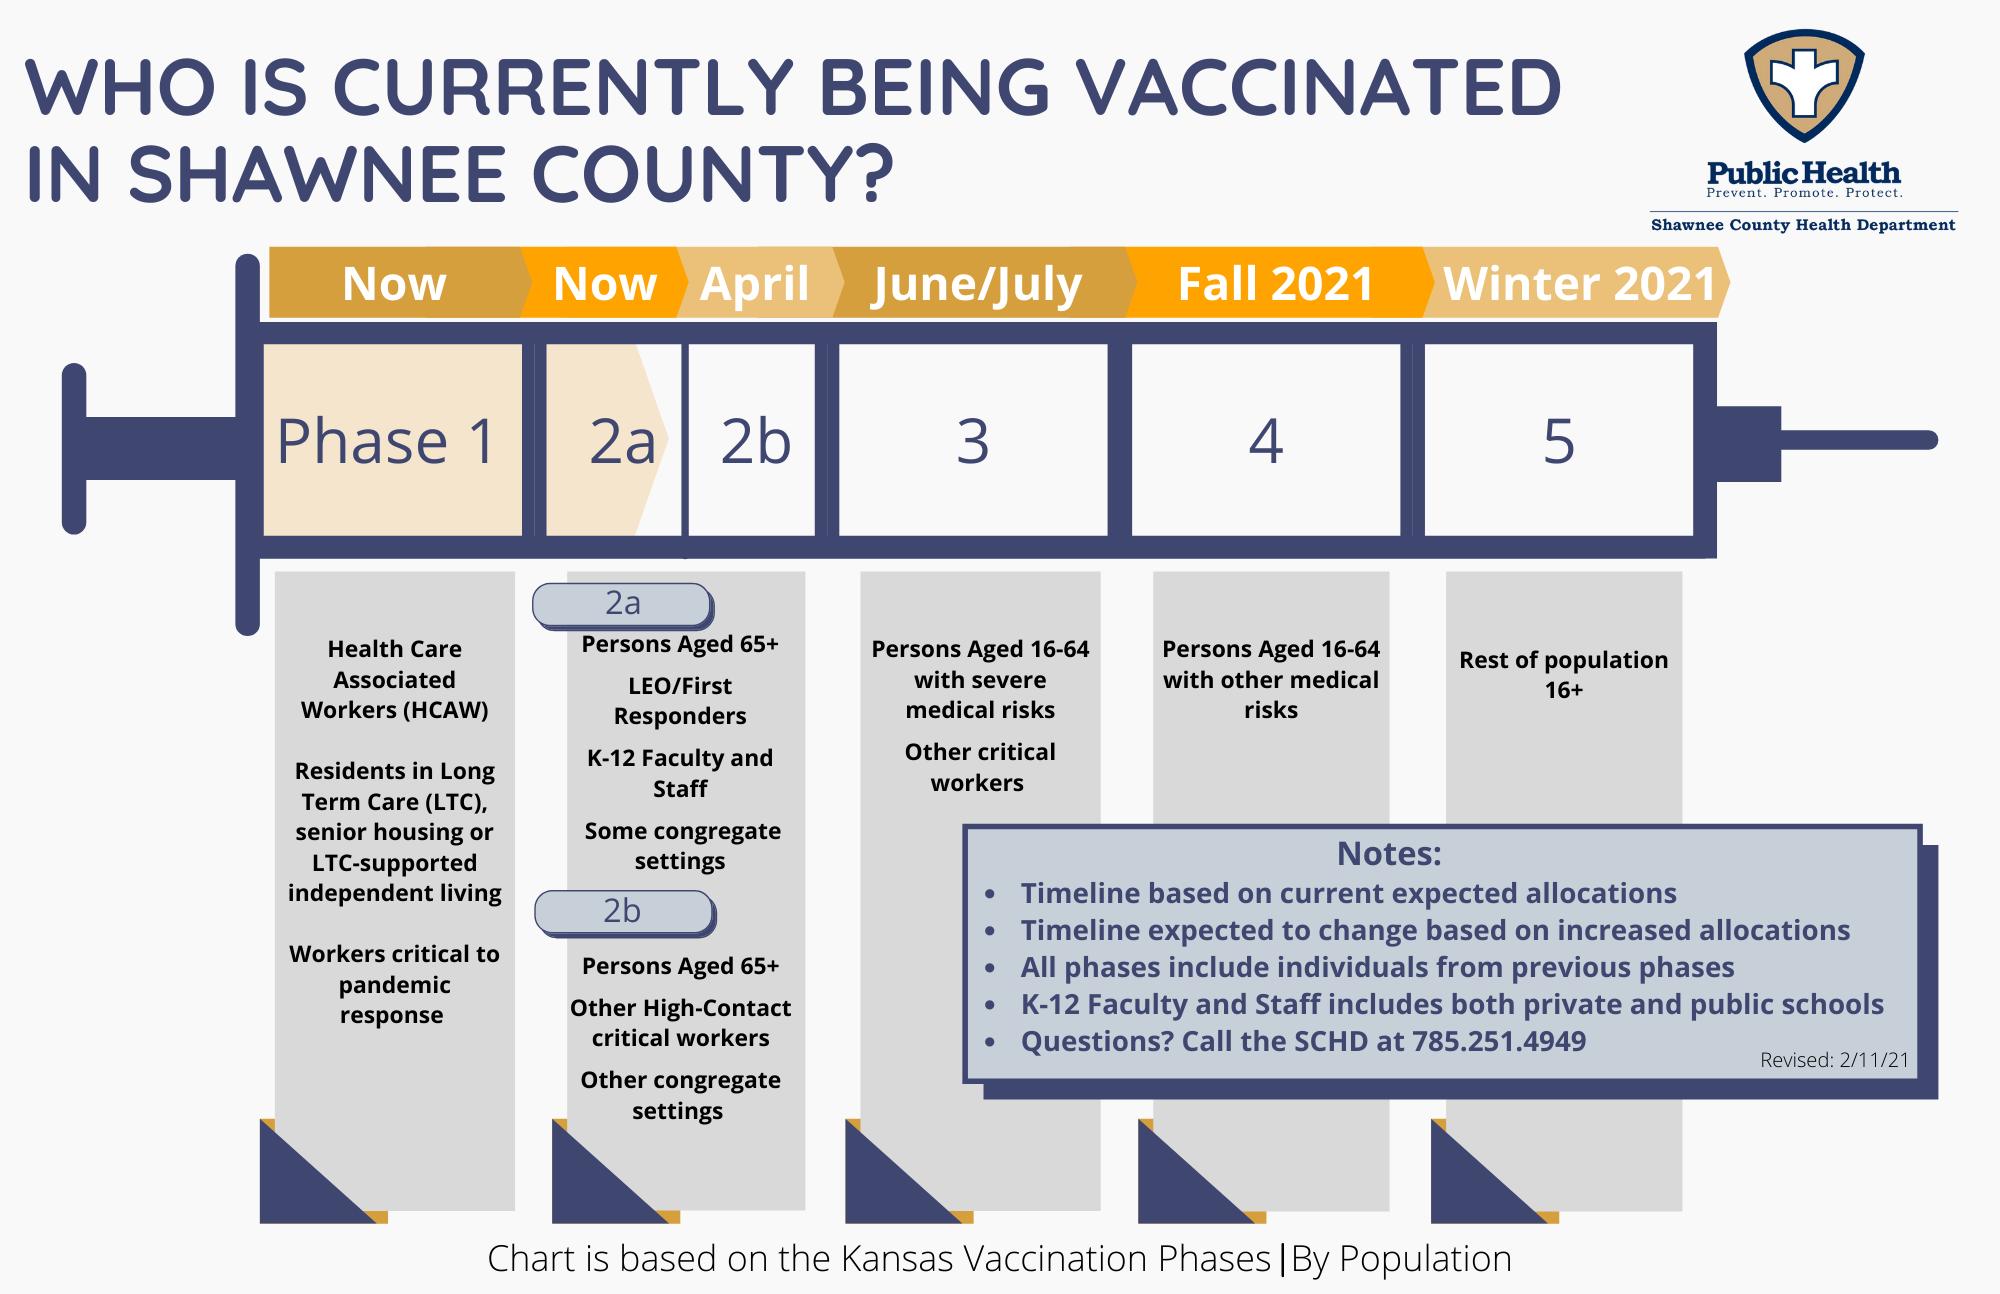 Covid 19 Vaccination Information Health Department Shawnee County Kansas